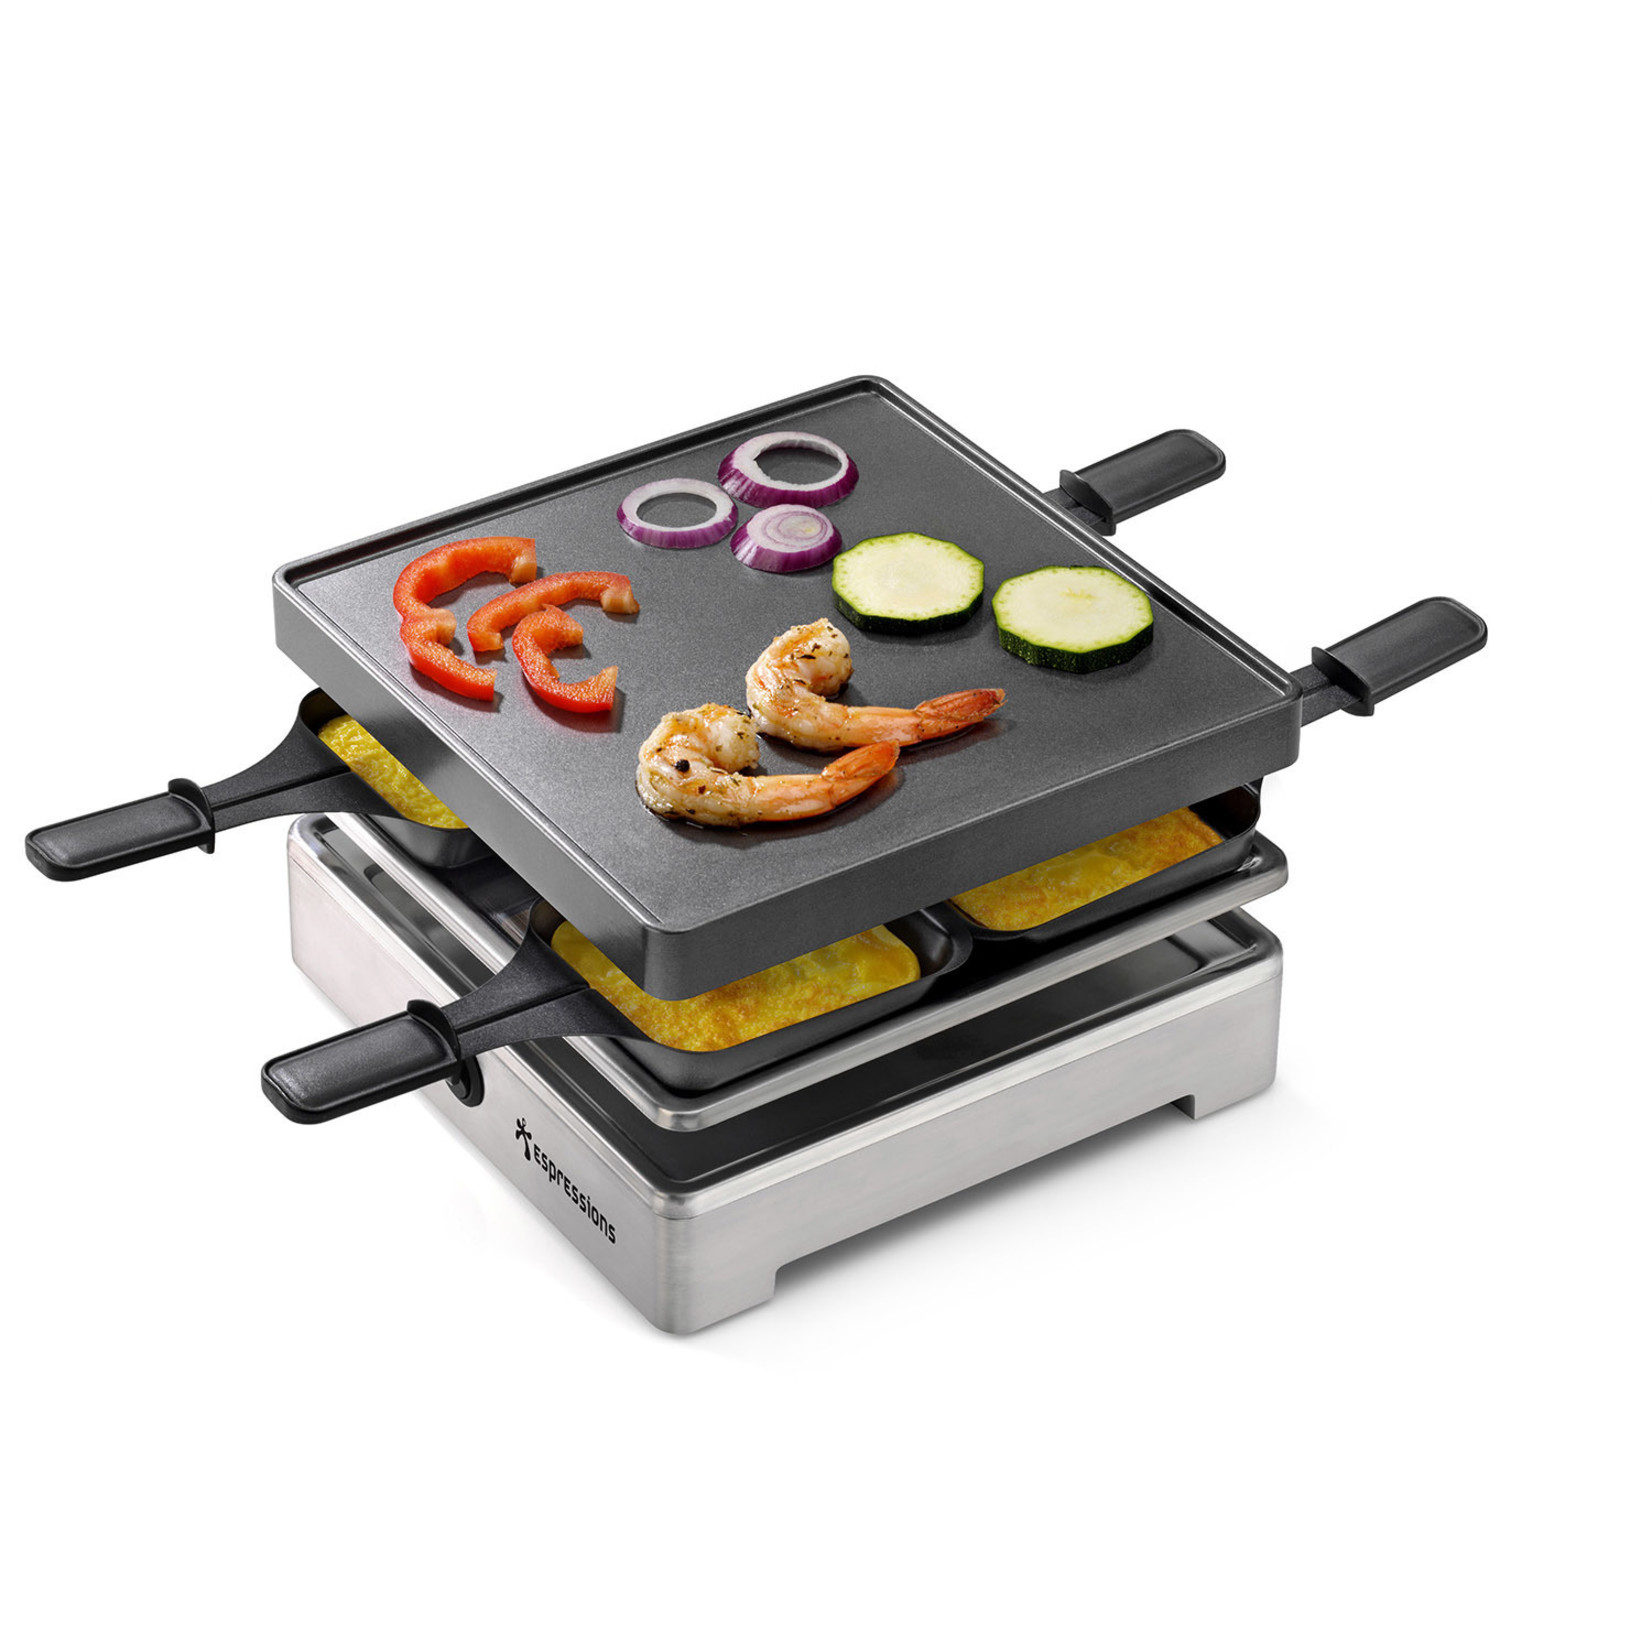 Espressions Espressions Gourmetstel - Raclette Grill Square 4-personen